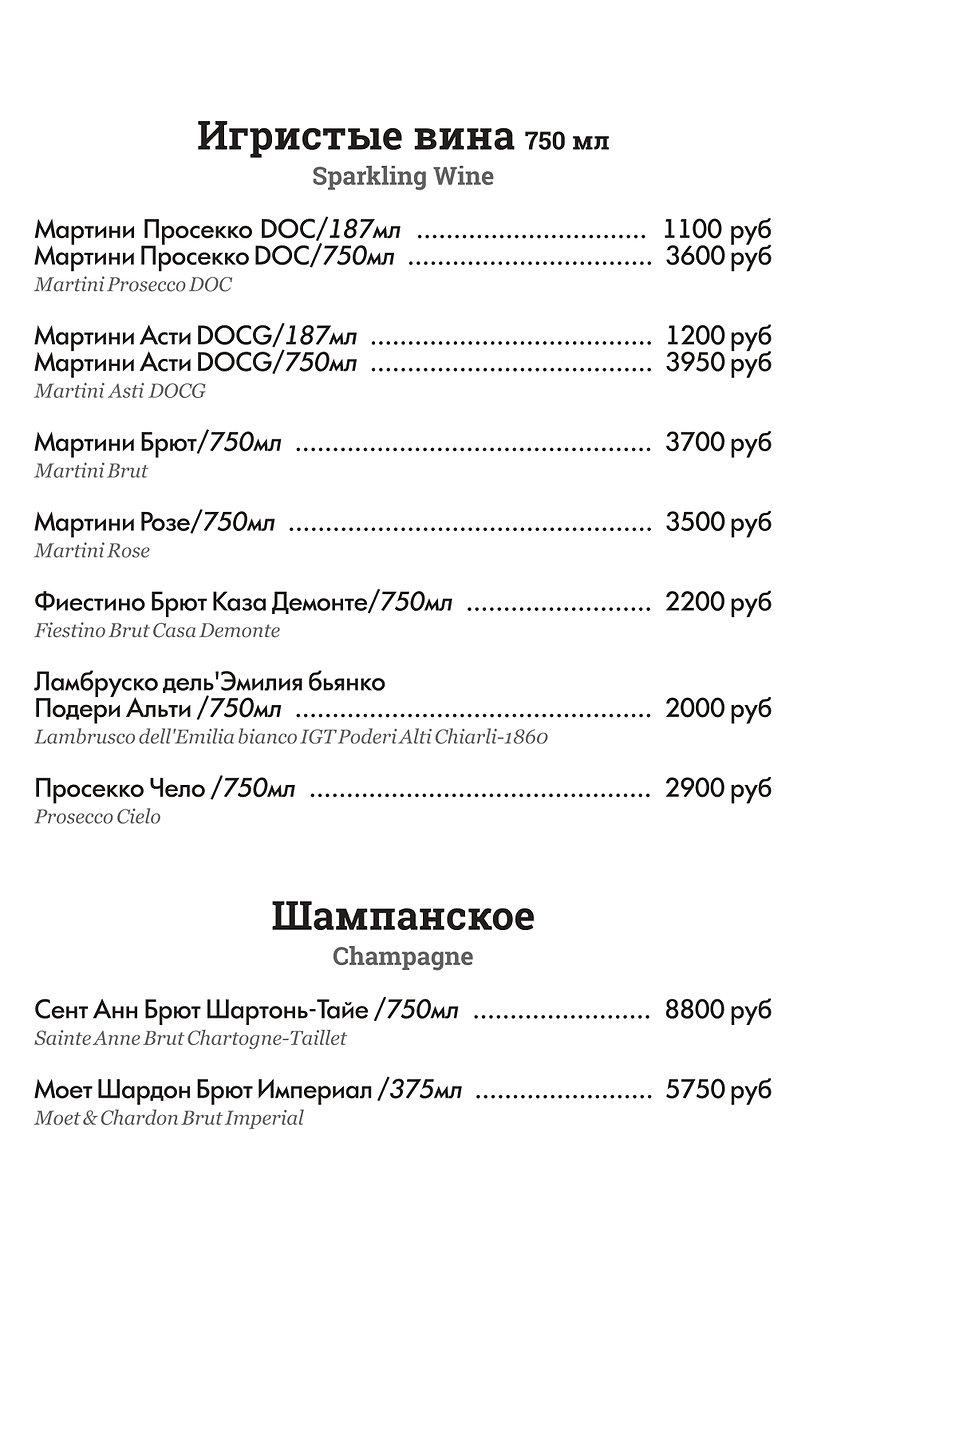 S46_bar_2021_ (2)_page-0002.jpg